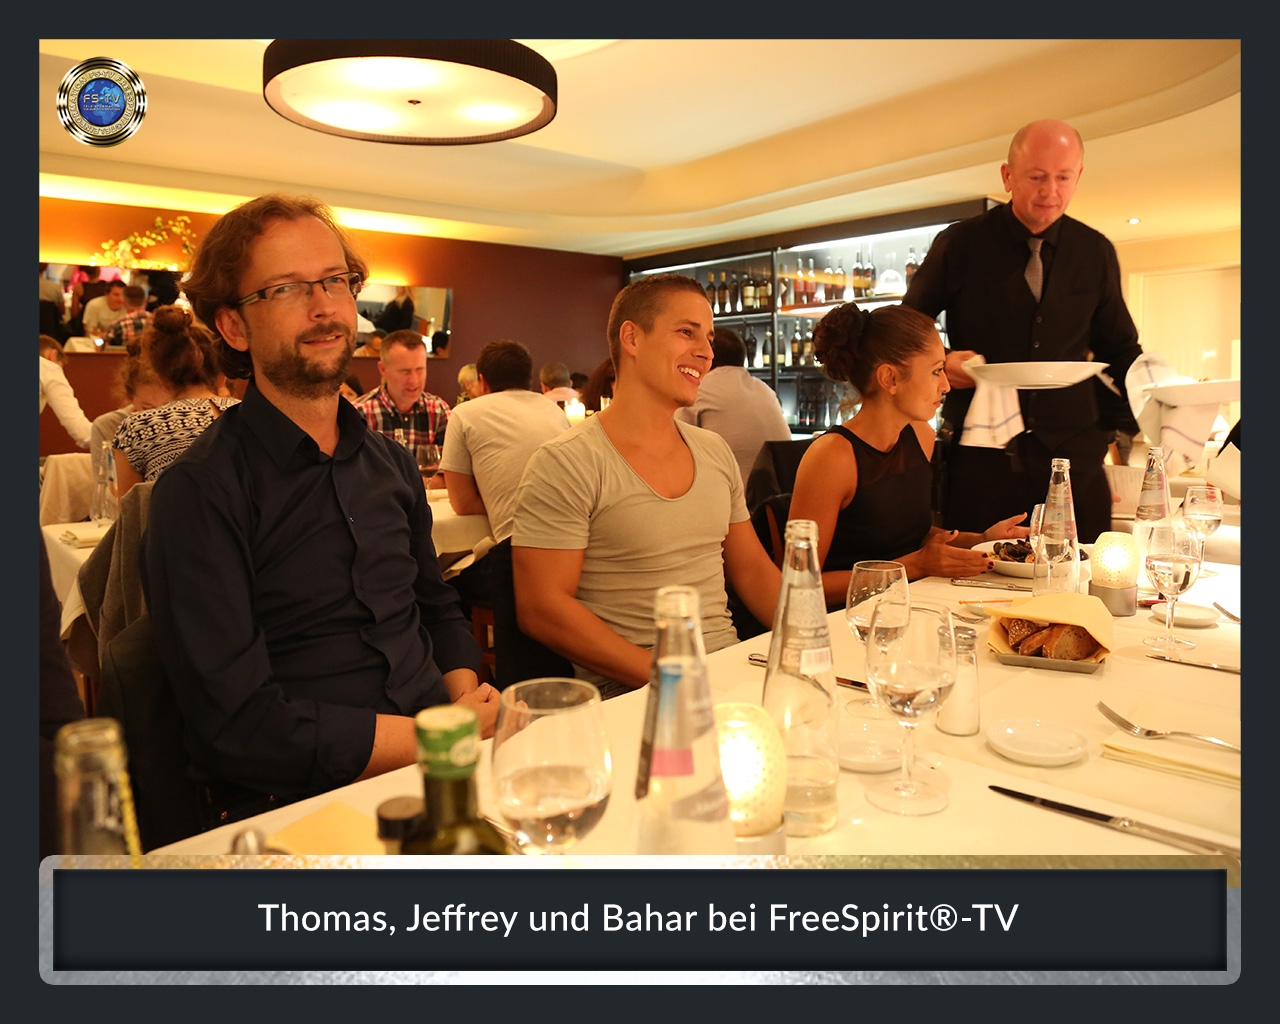 FS-TV-Bildergallerie-Thomas-Jeffrey-Bahar-1